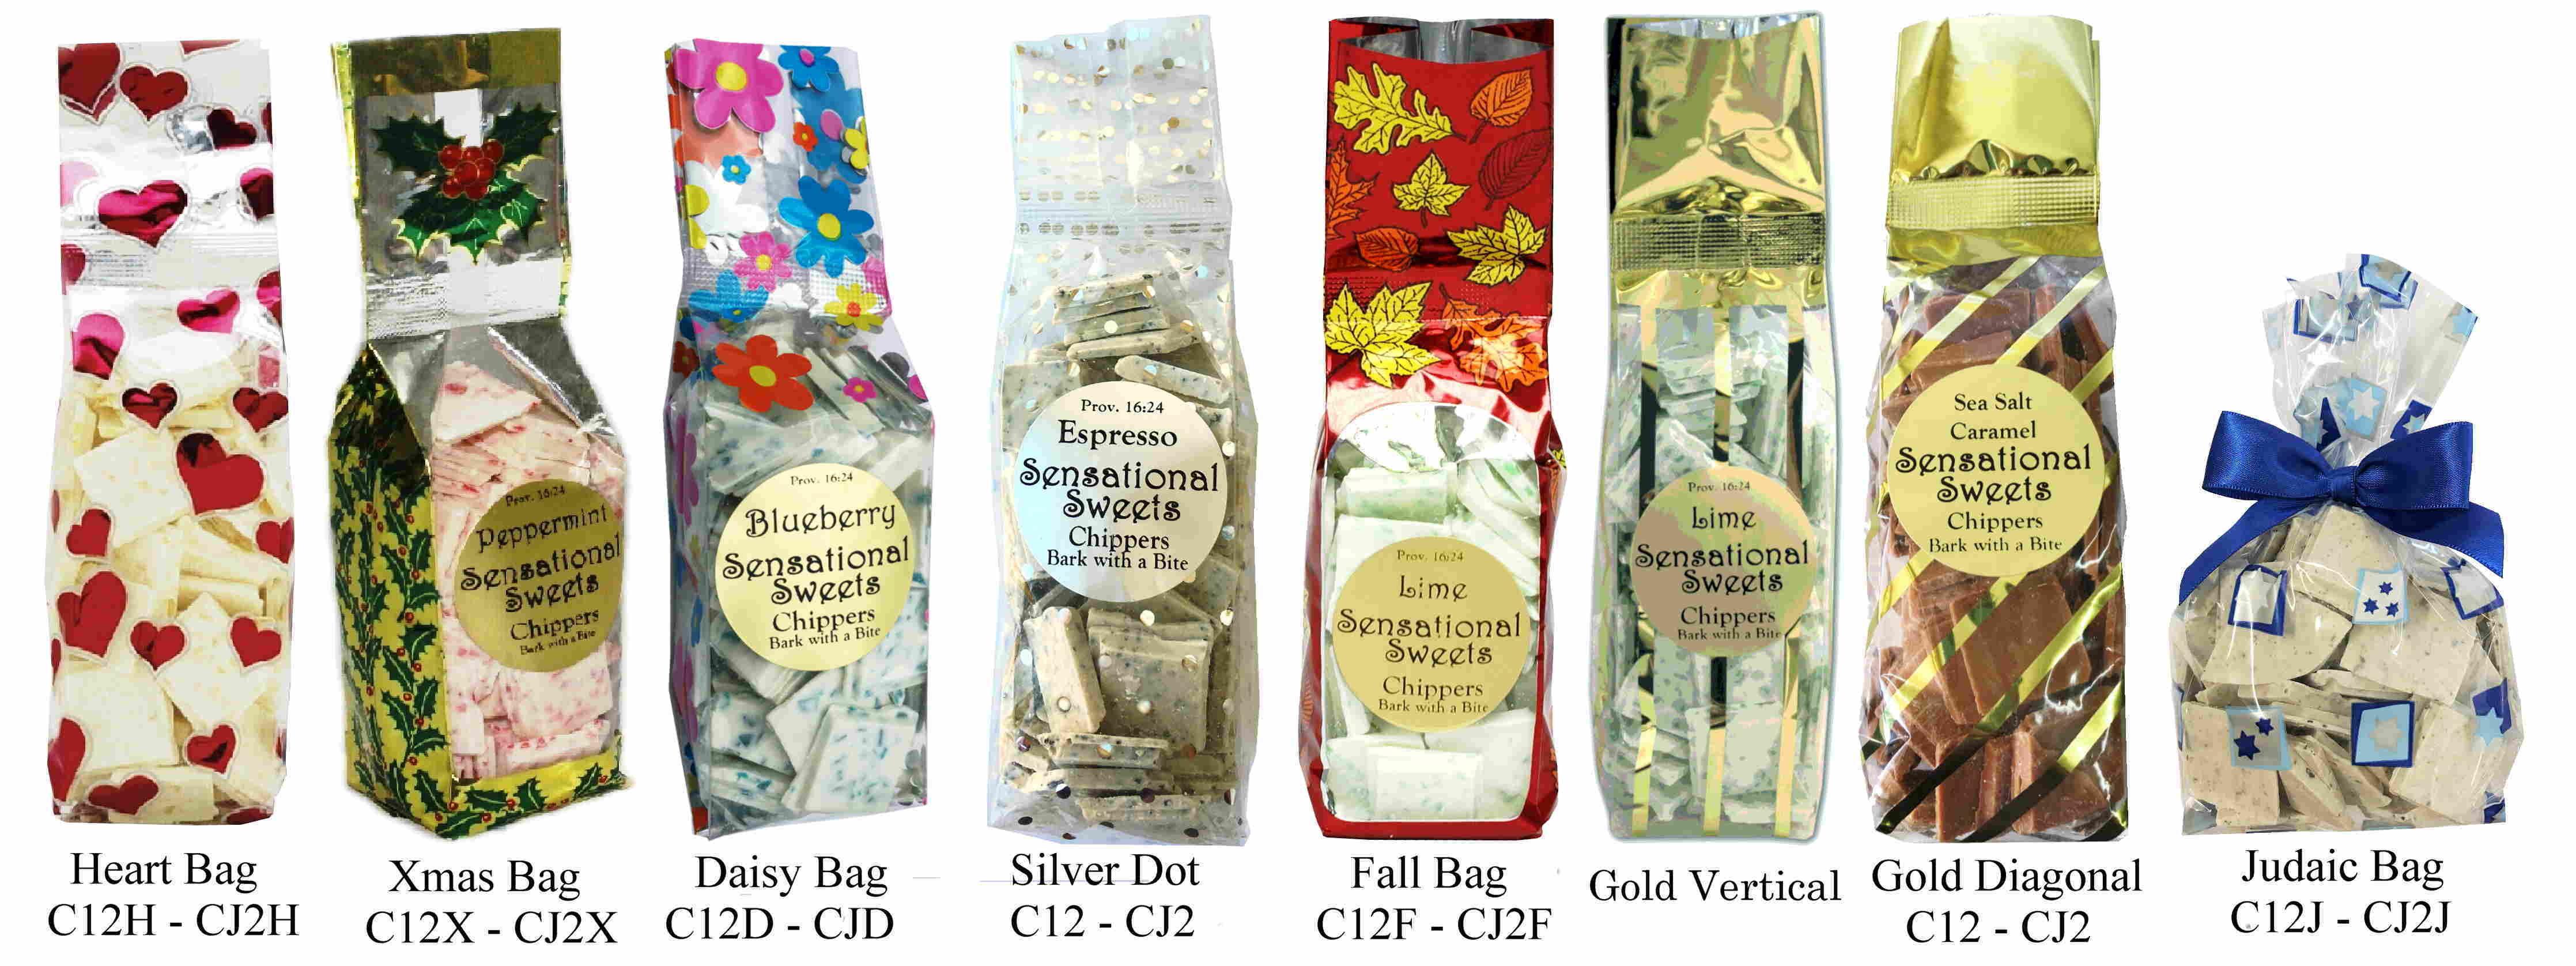 Seasonal Bag 8 oz. Seasonal Bags